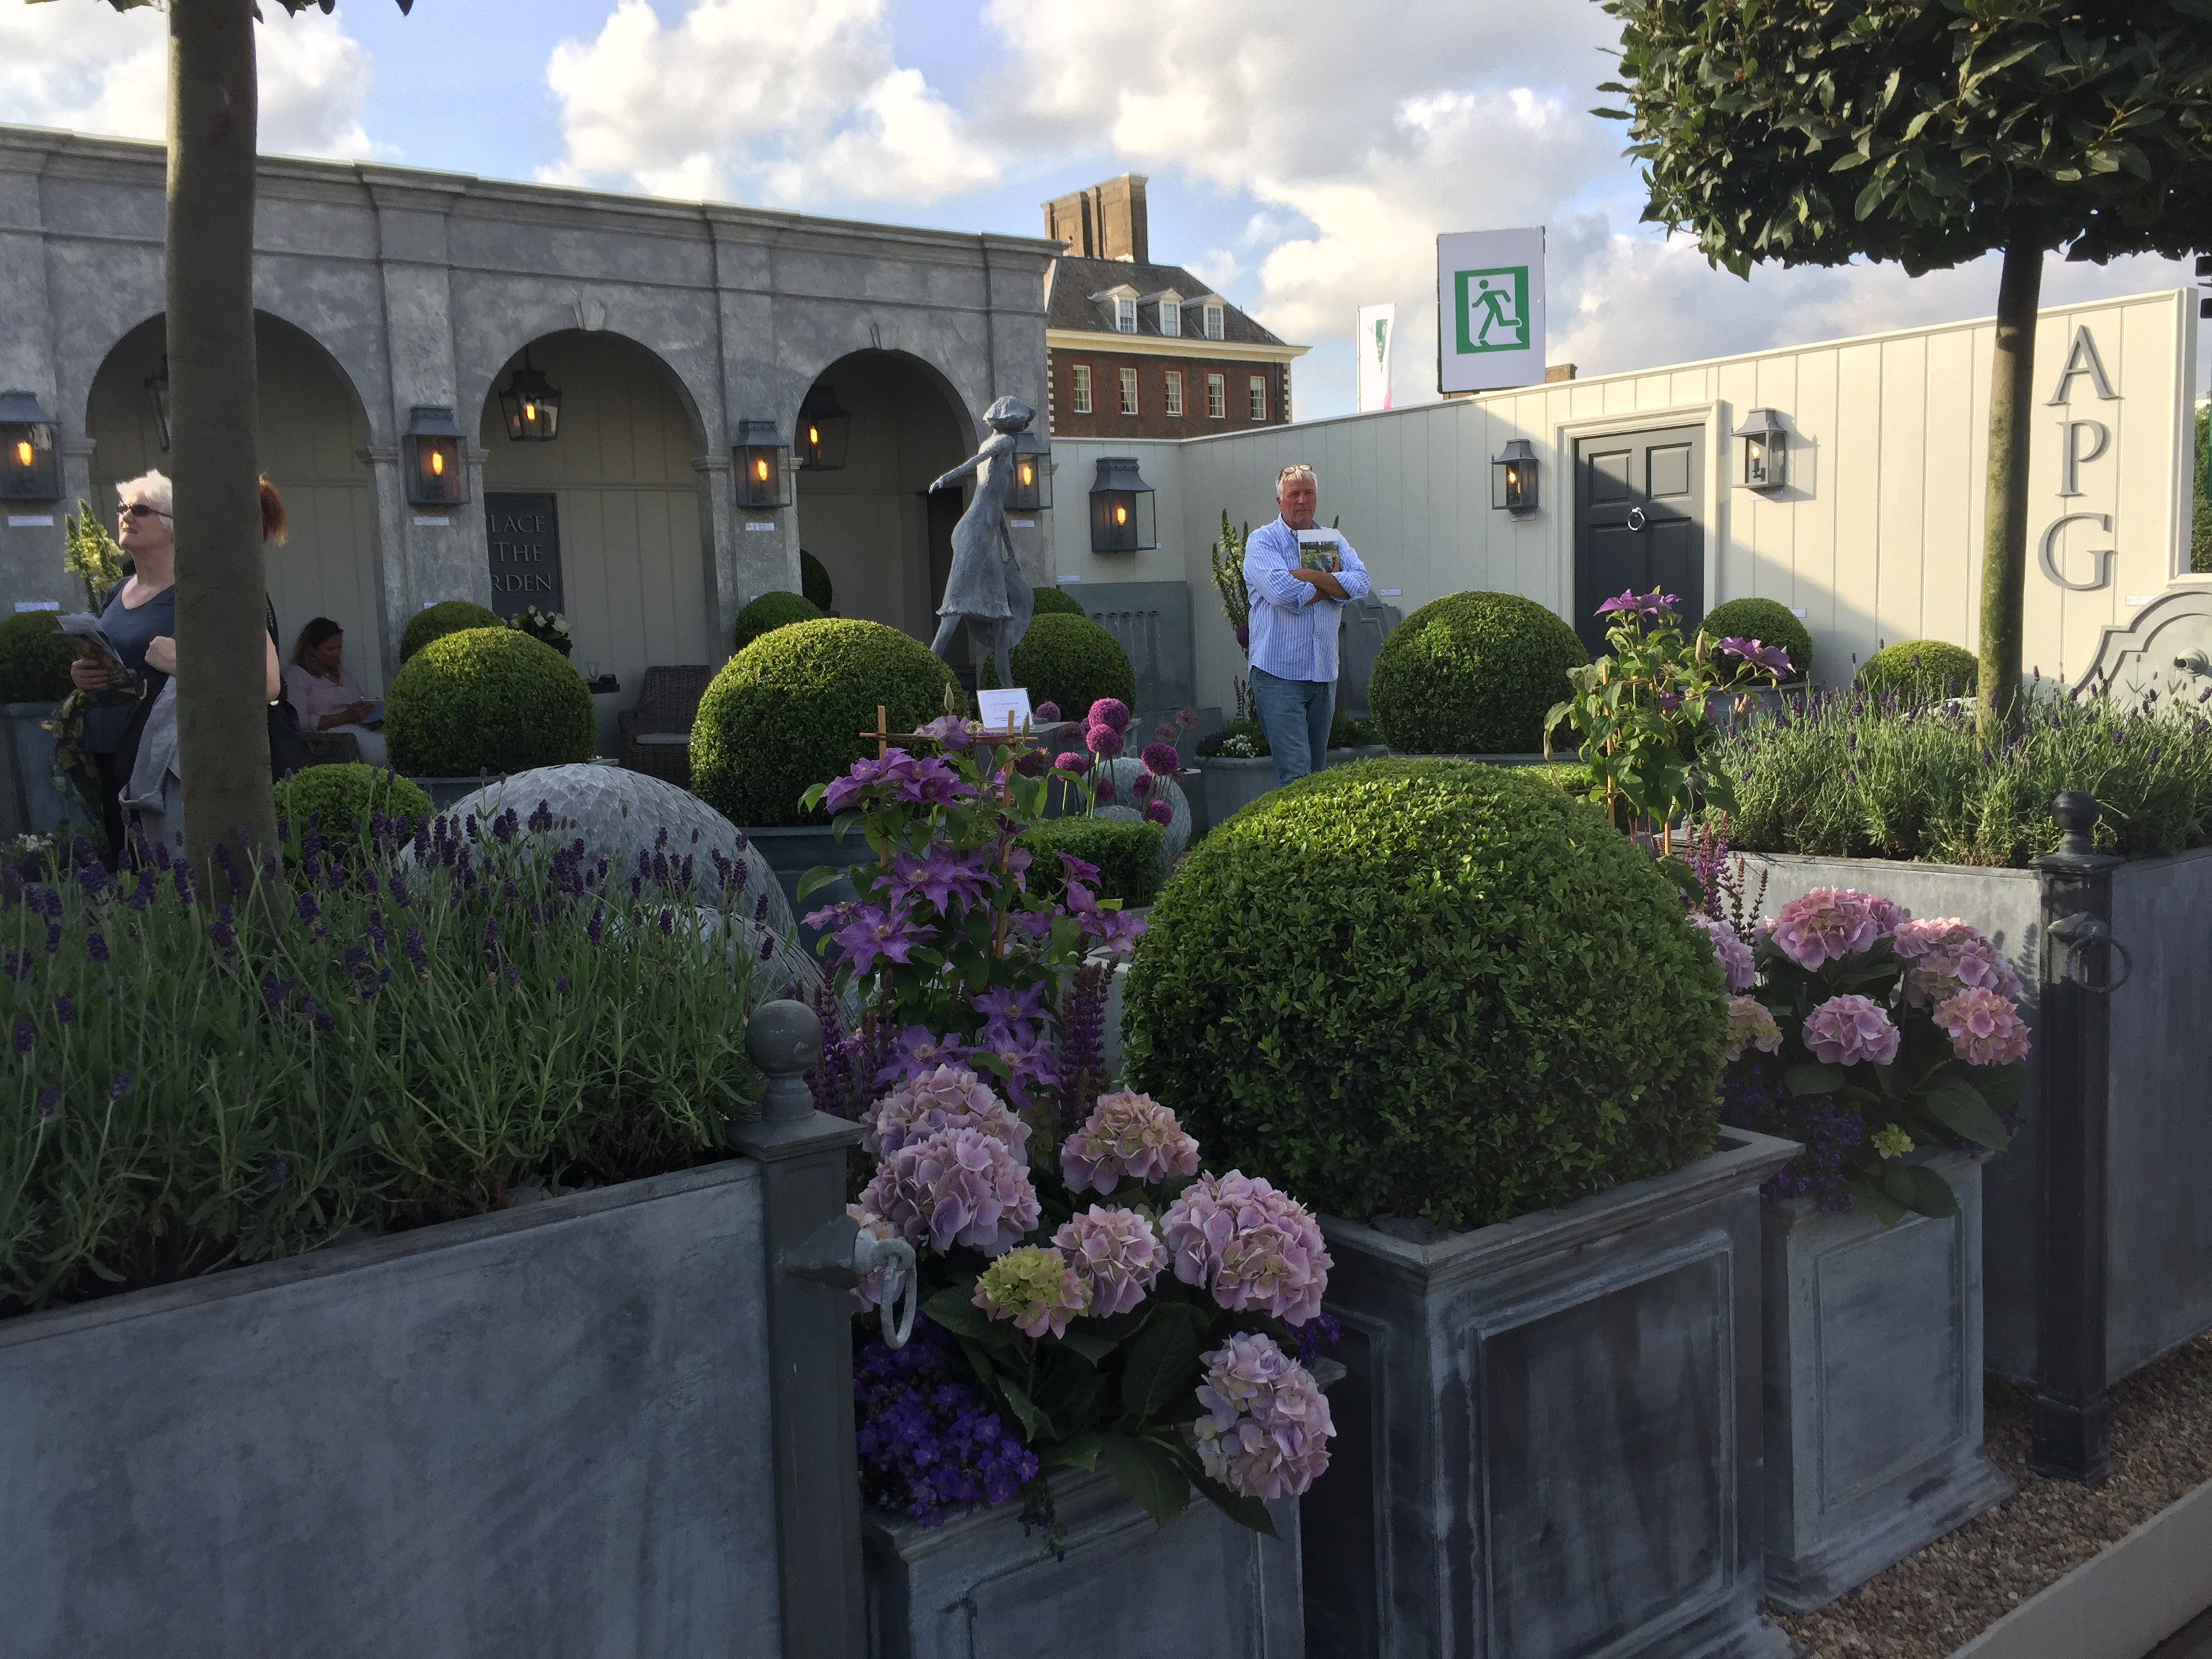 chelsea flower show london 2017 london garden blog. Black Bedroom Furniture Sets. Home Design Ideas